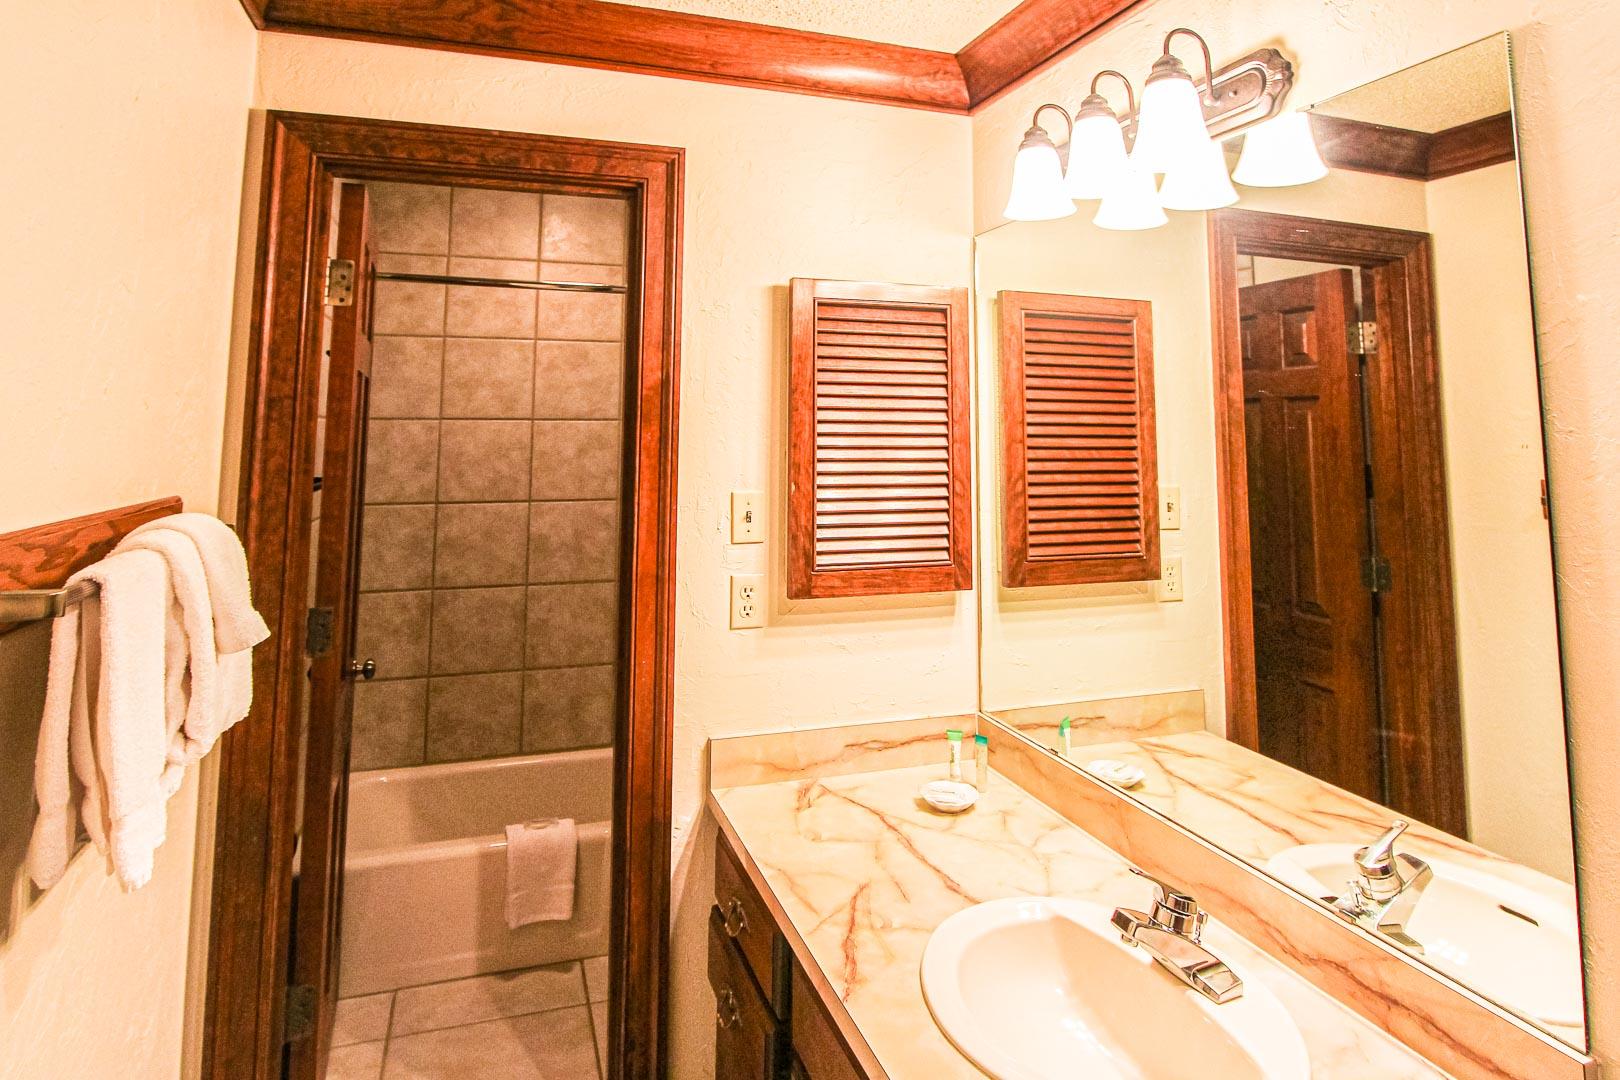 A clean bathroom at VRI's Sunburst Resort in Steamboat Springs, Colorado.